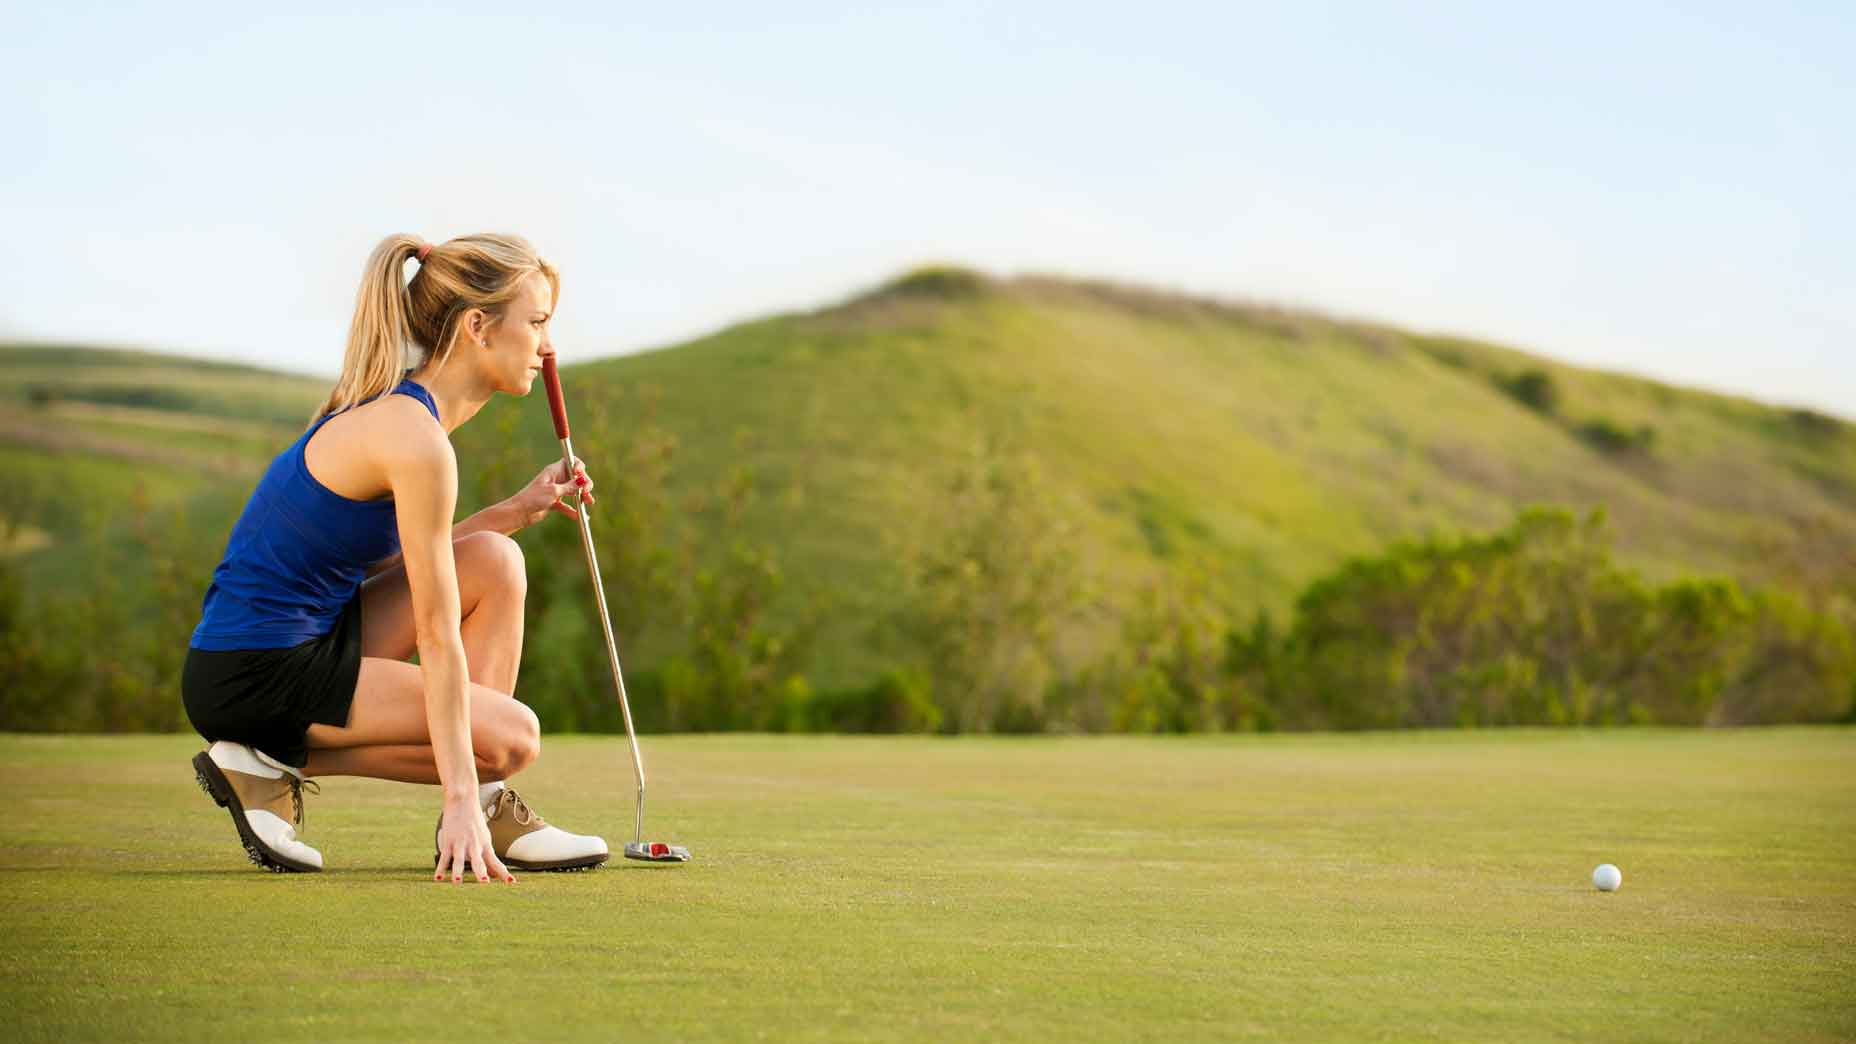 golfer focus